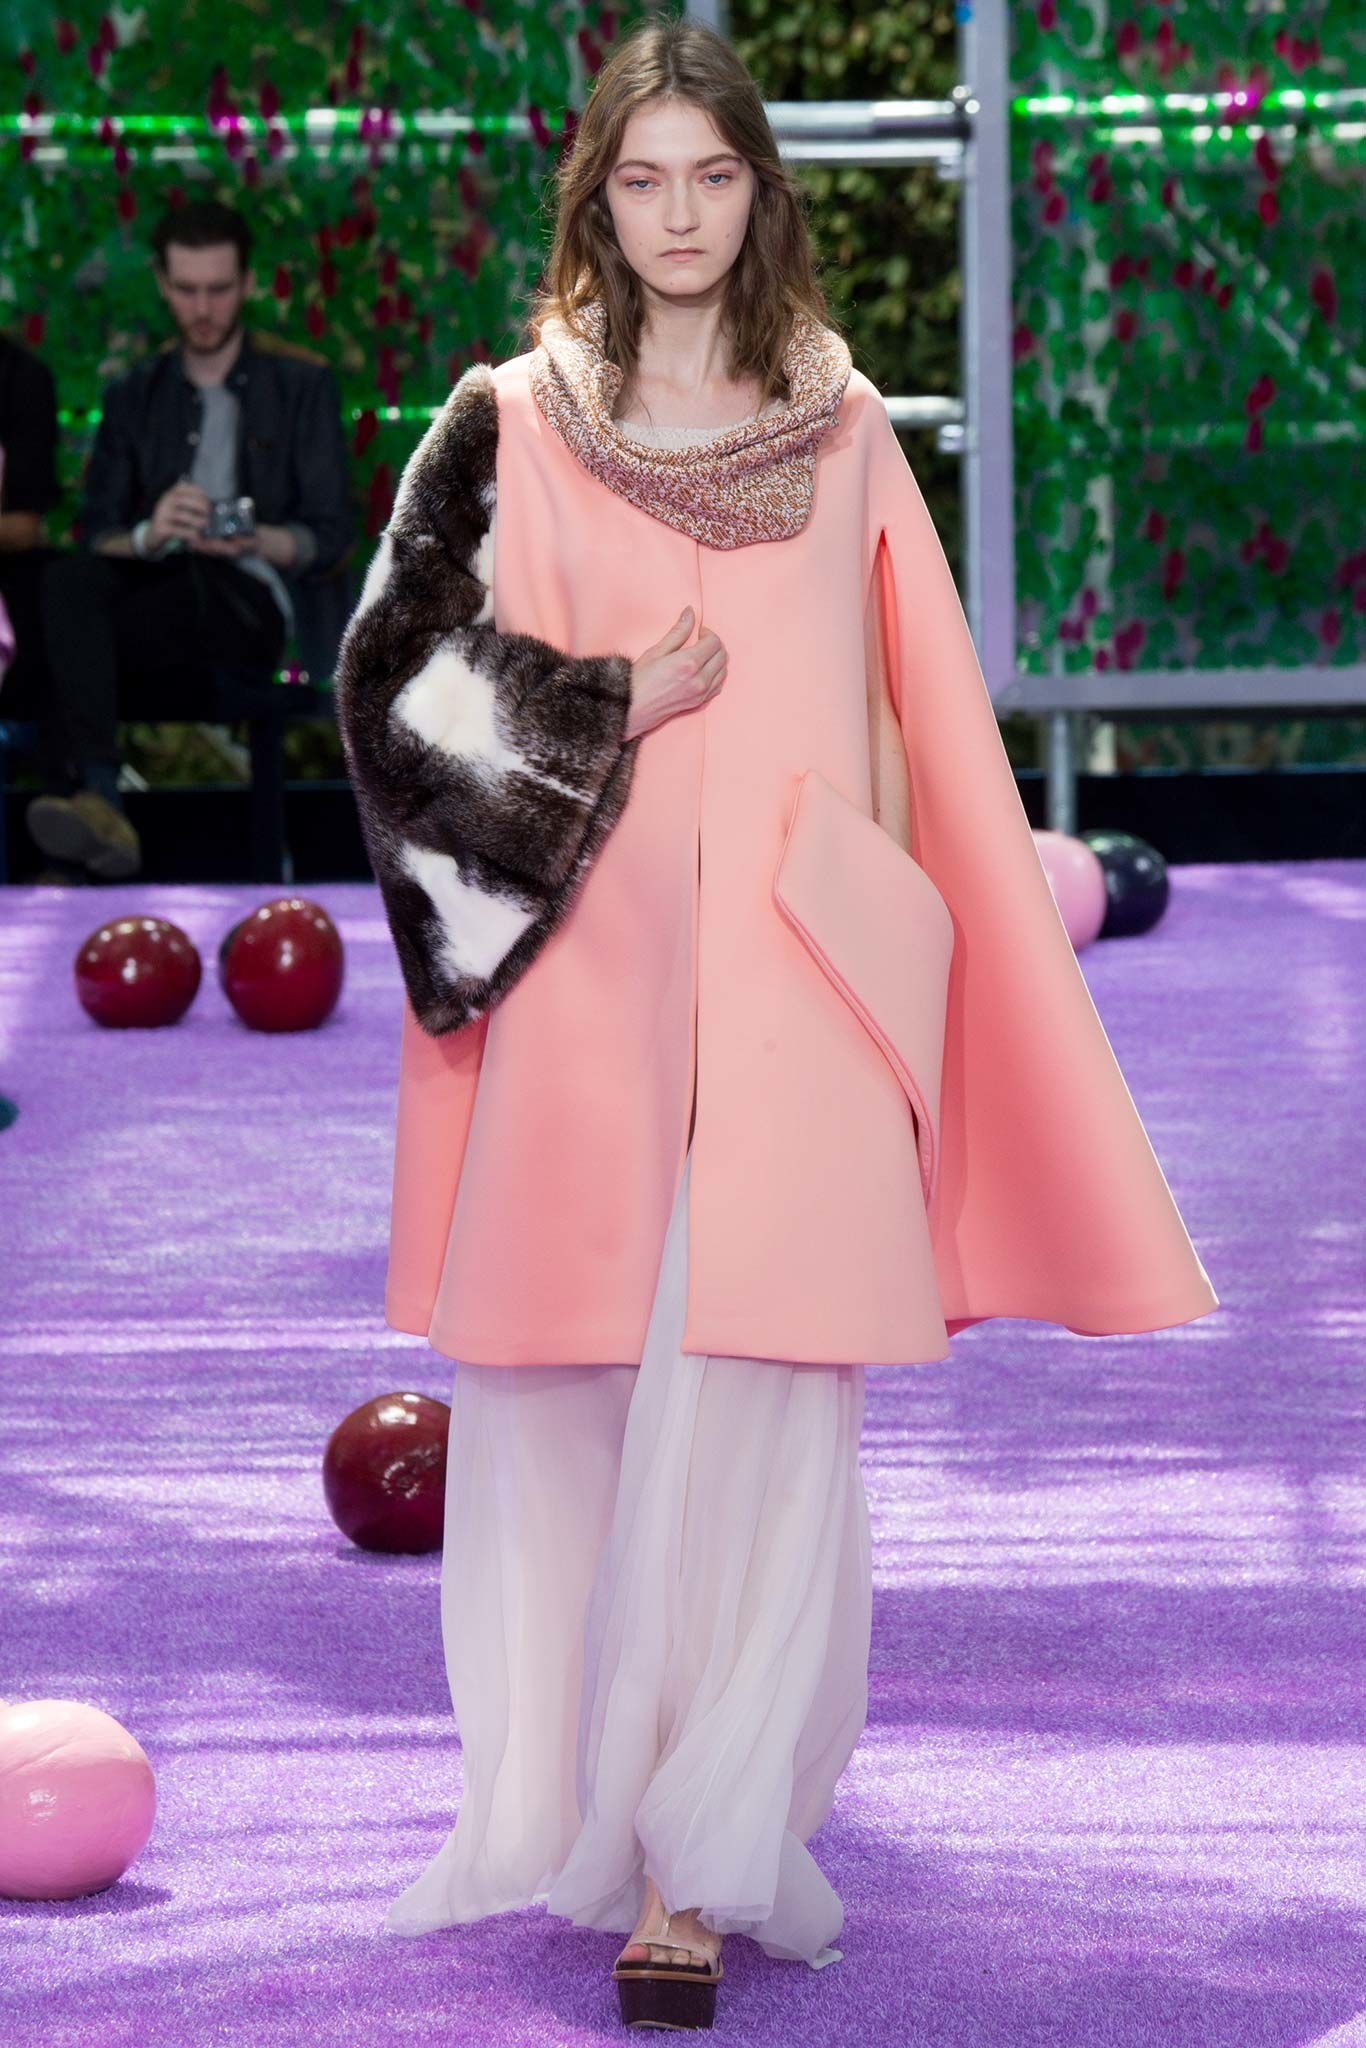 rihanna-attends-dior-spring-2016-show-at-paris-fashion-week